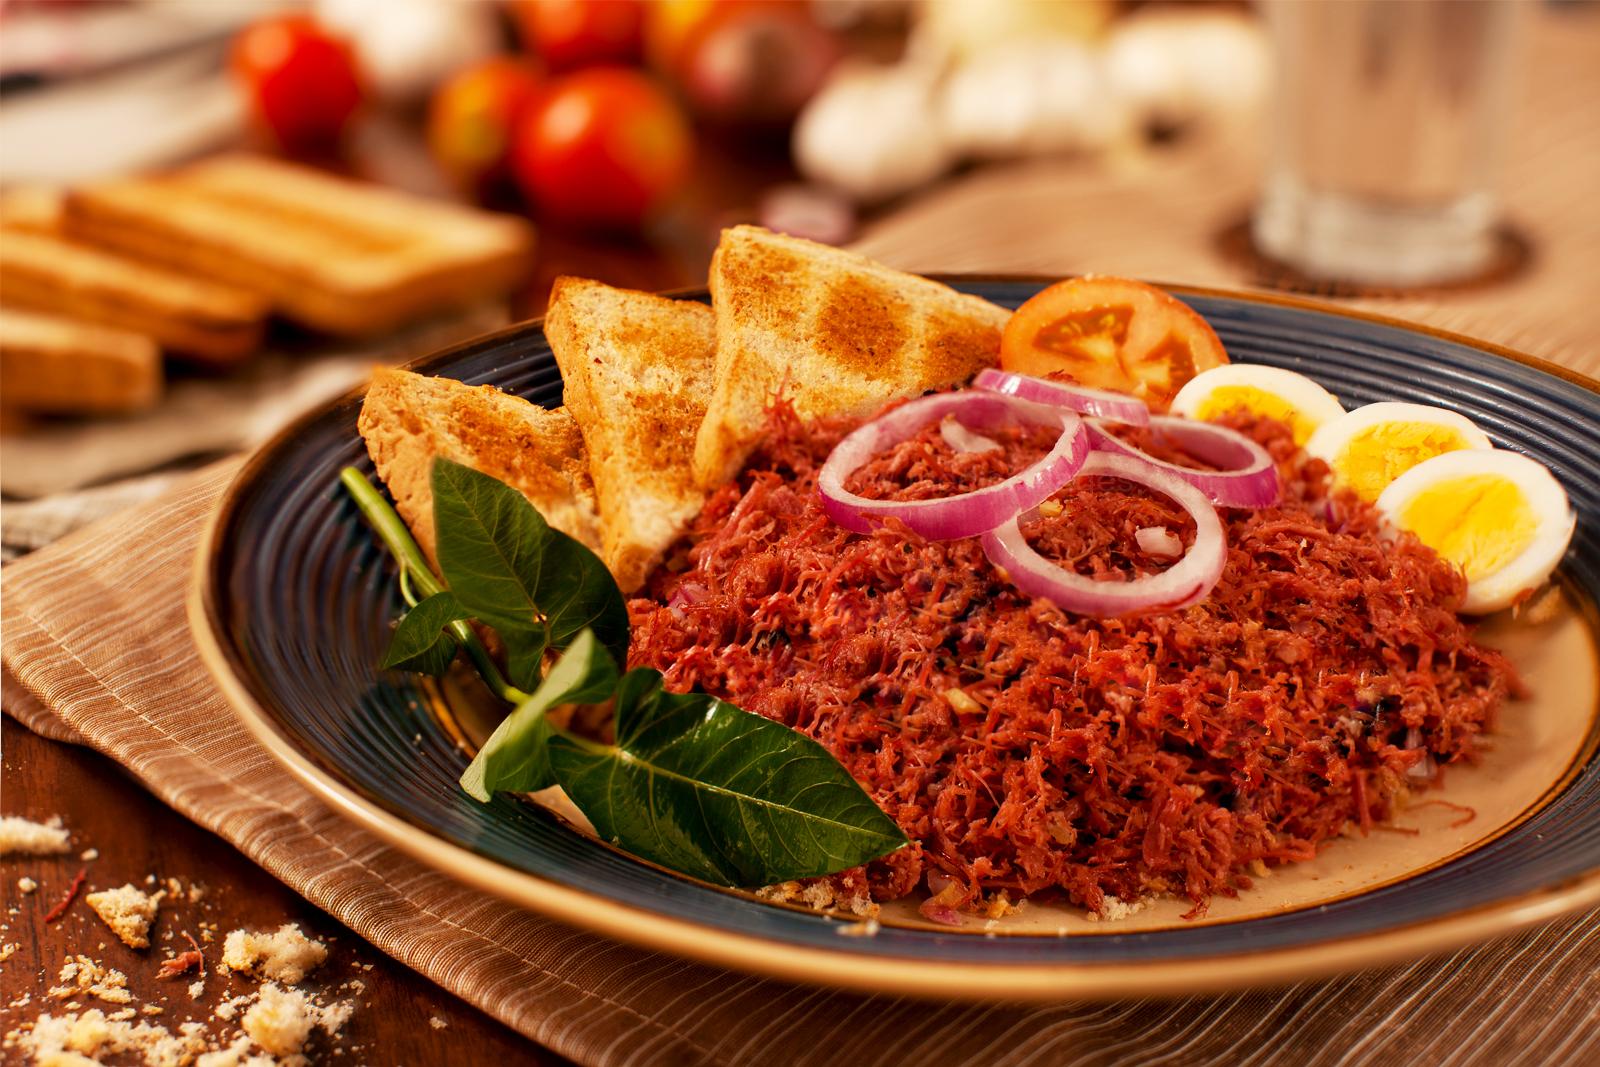 Food Cornedbeef by homermedici